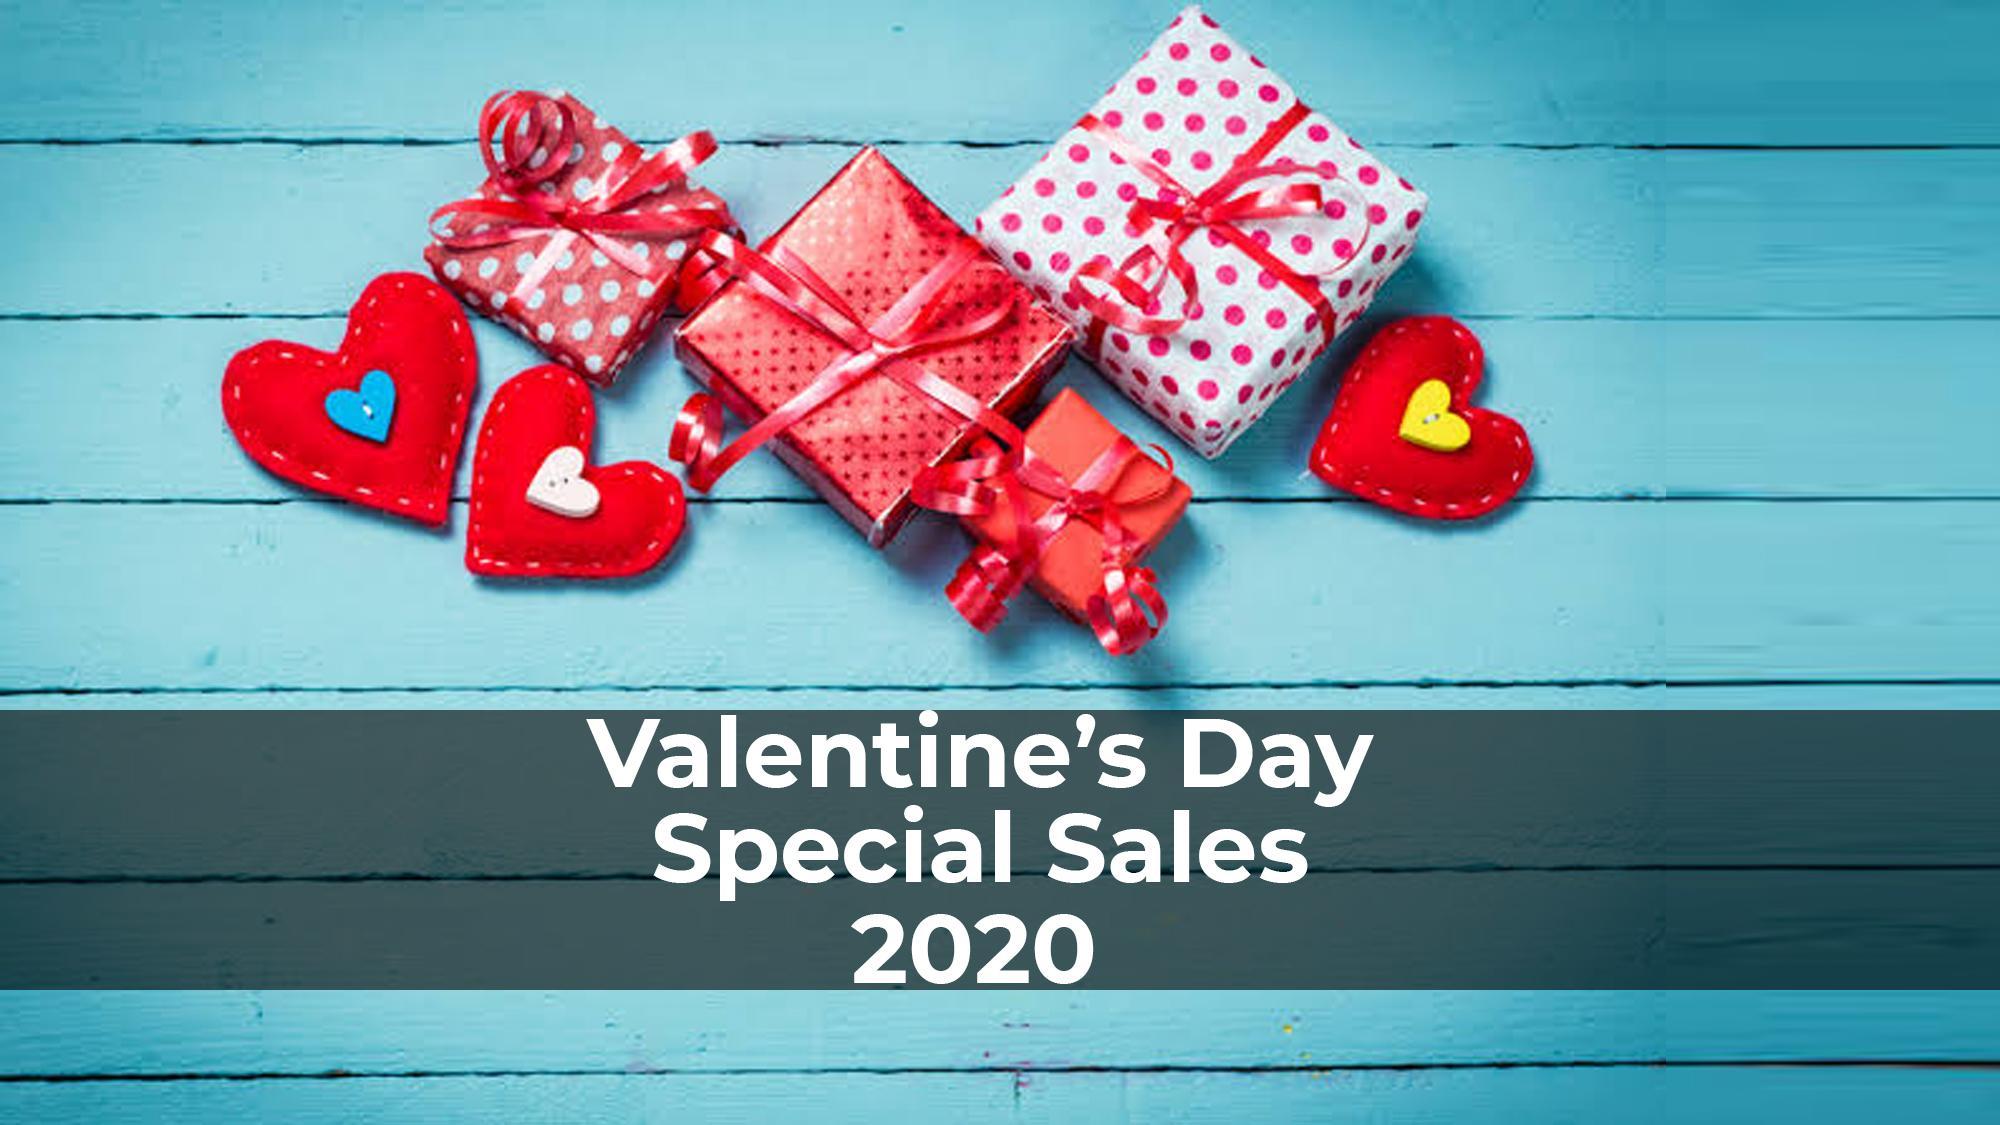 Valentine's Day Special Sales 2020